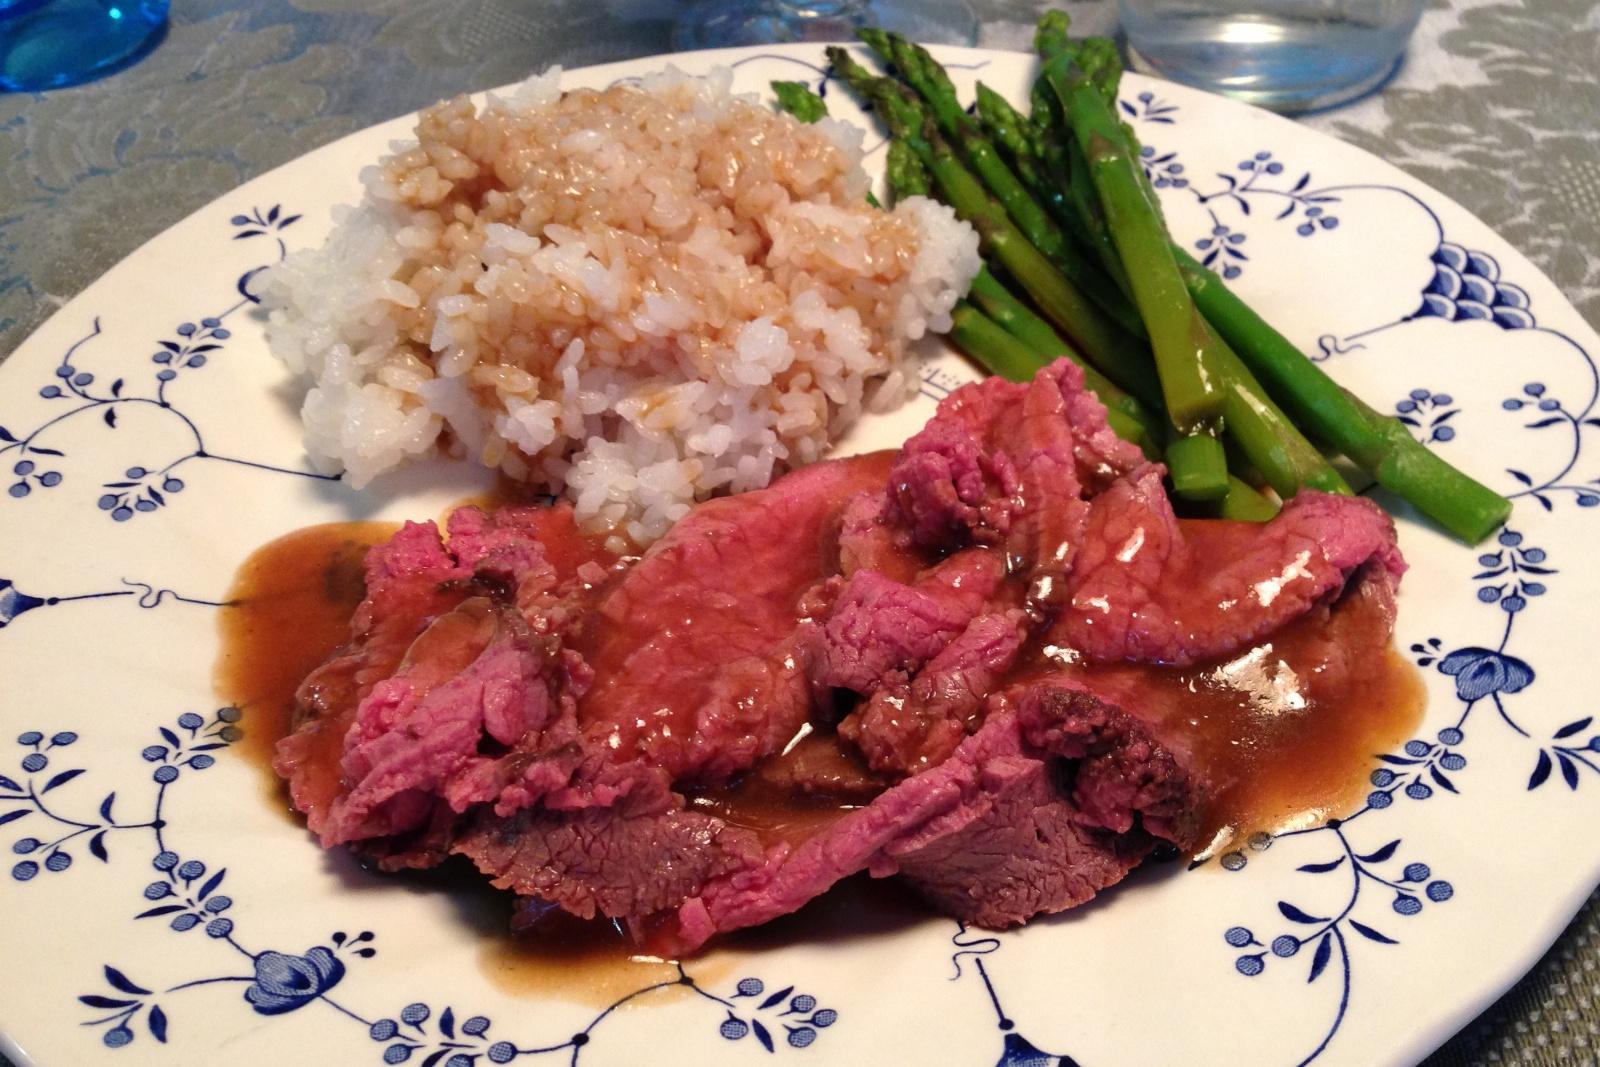 http://blog.rickk.com/food/2013/08/29/ate.2013.08.29.d.jpg